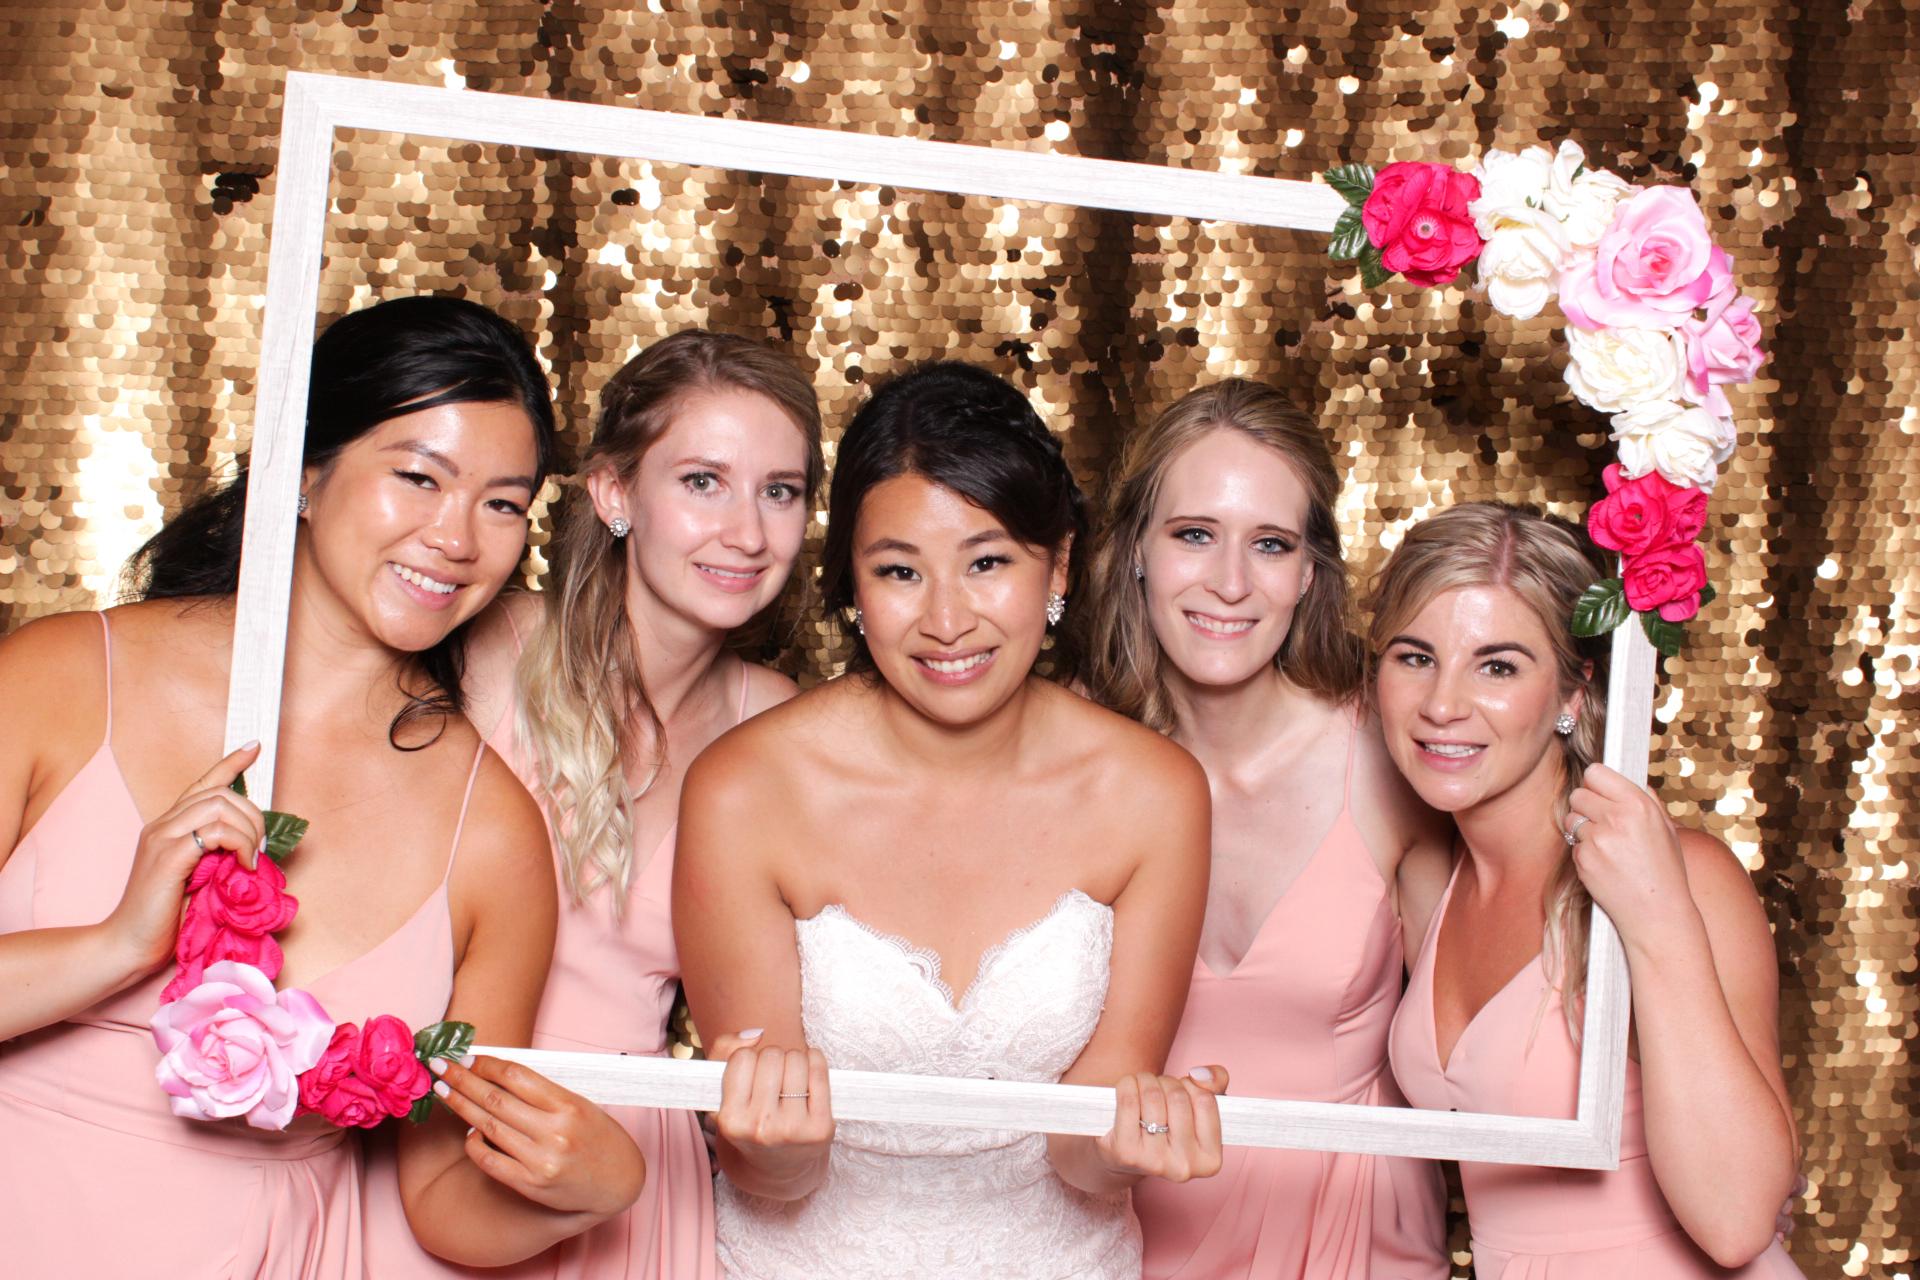 calgary bride and bridesmaids 2017